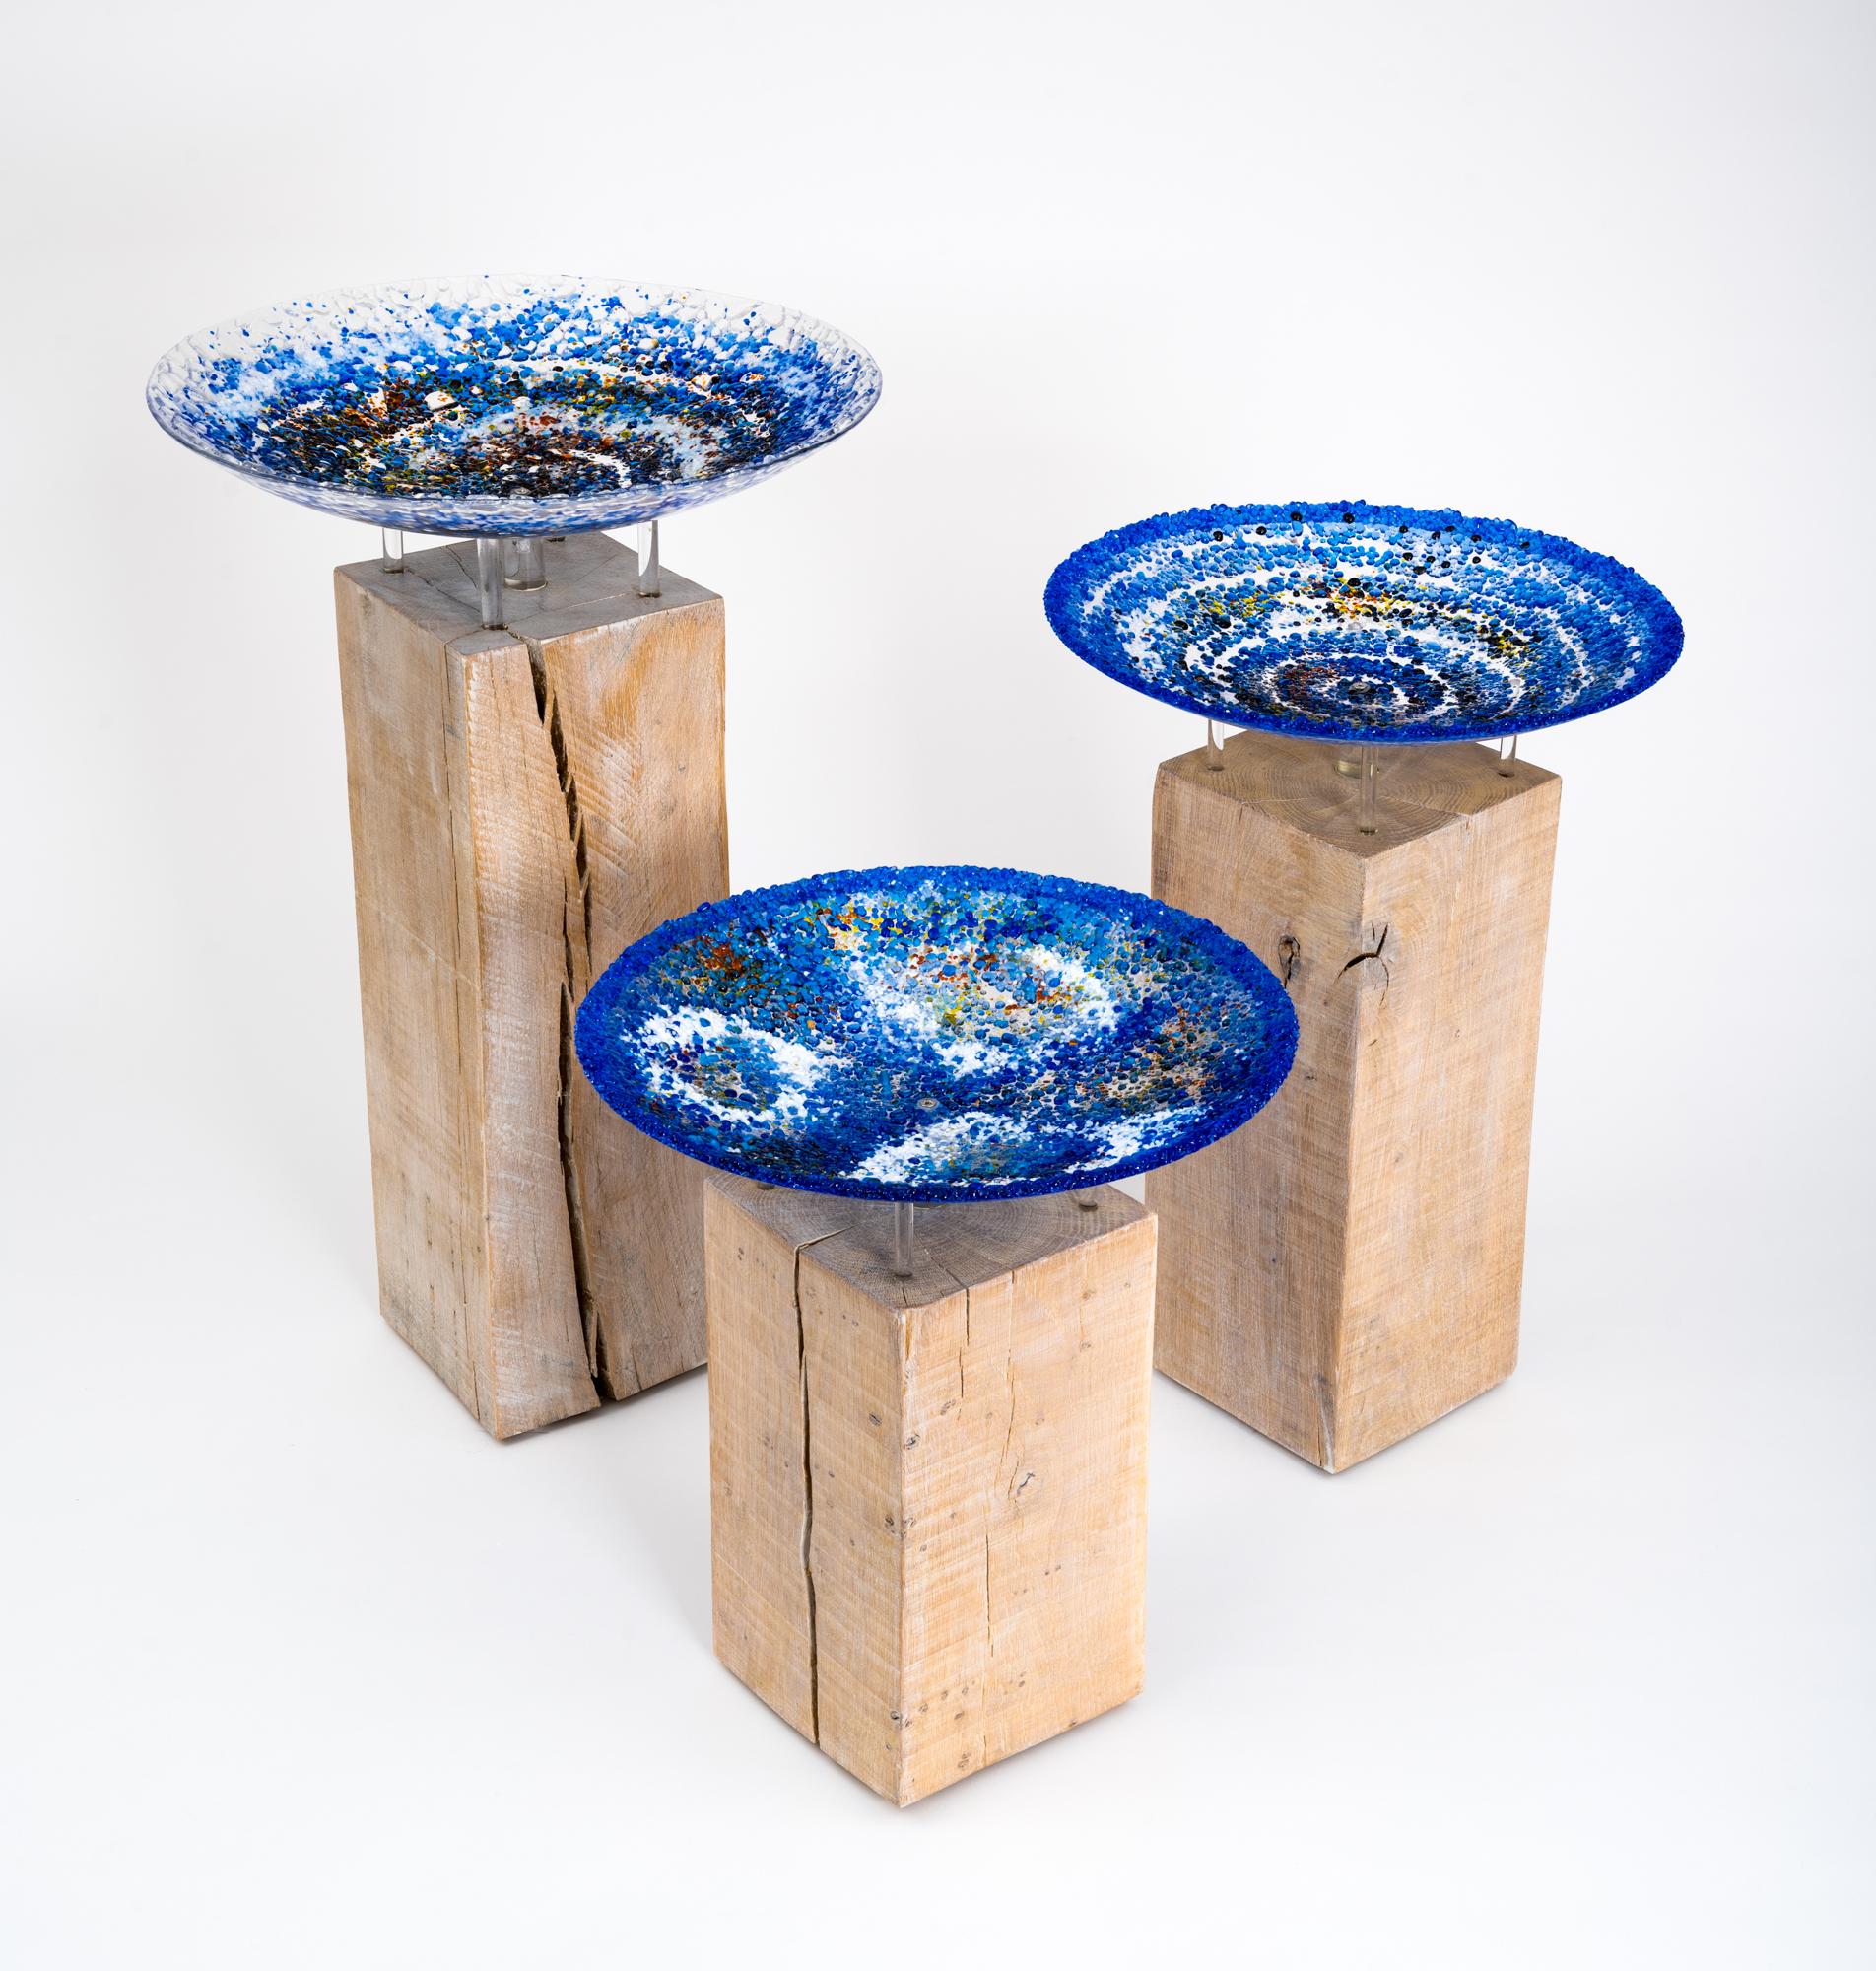 Change Trio: Still Waters (32cm), Ripple (32cm), Maelstrom (37cm)